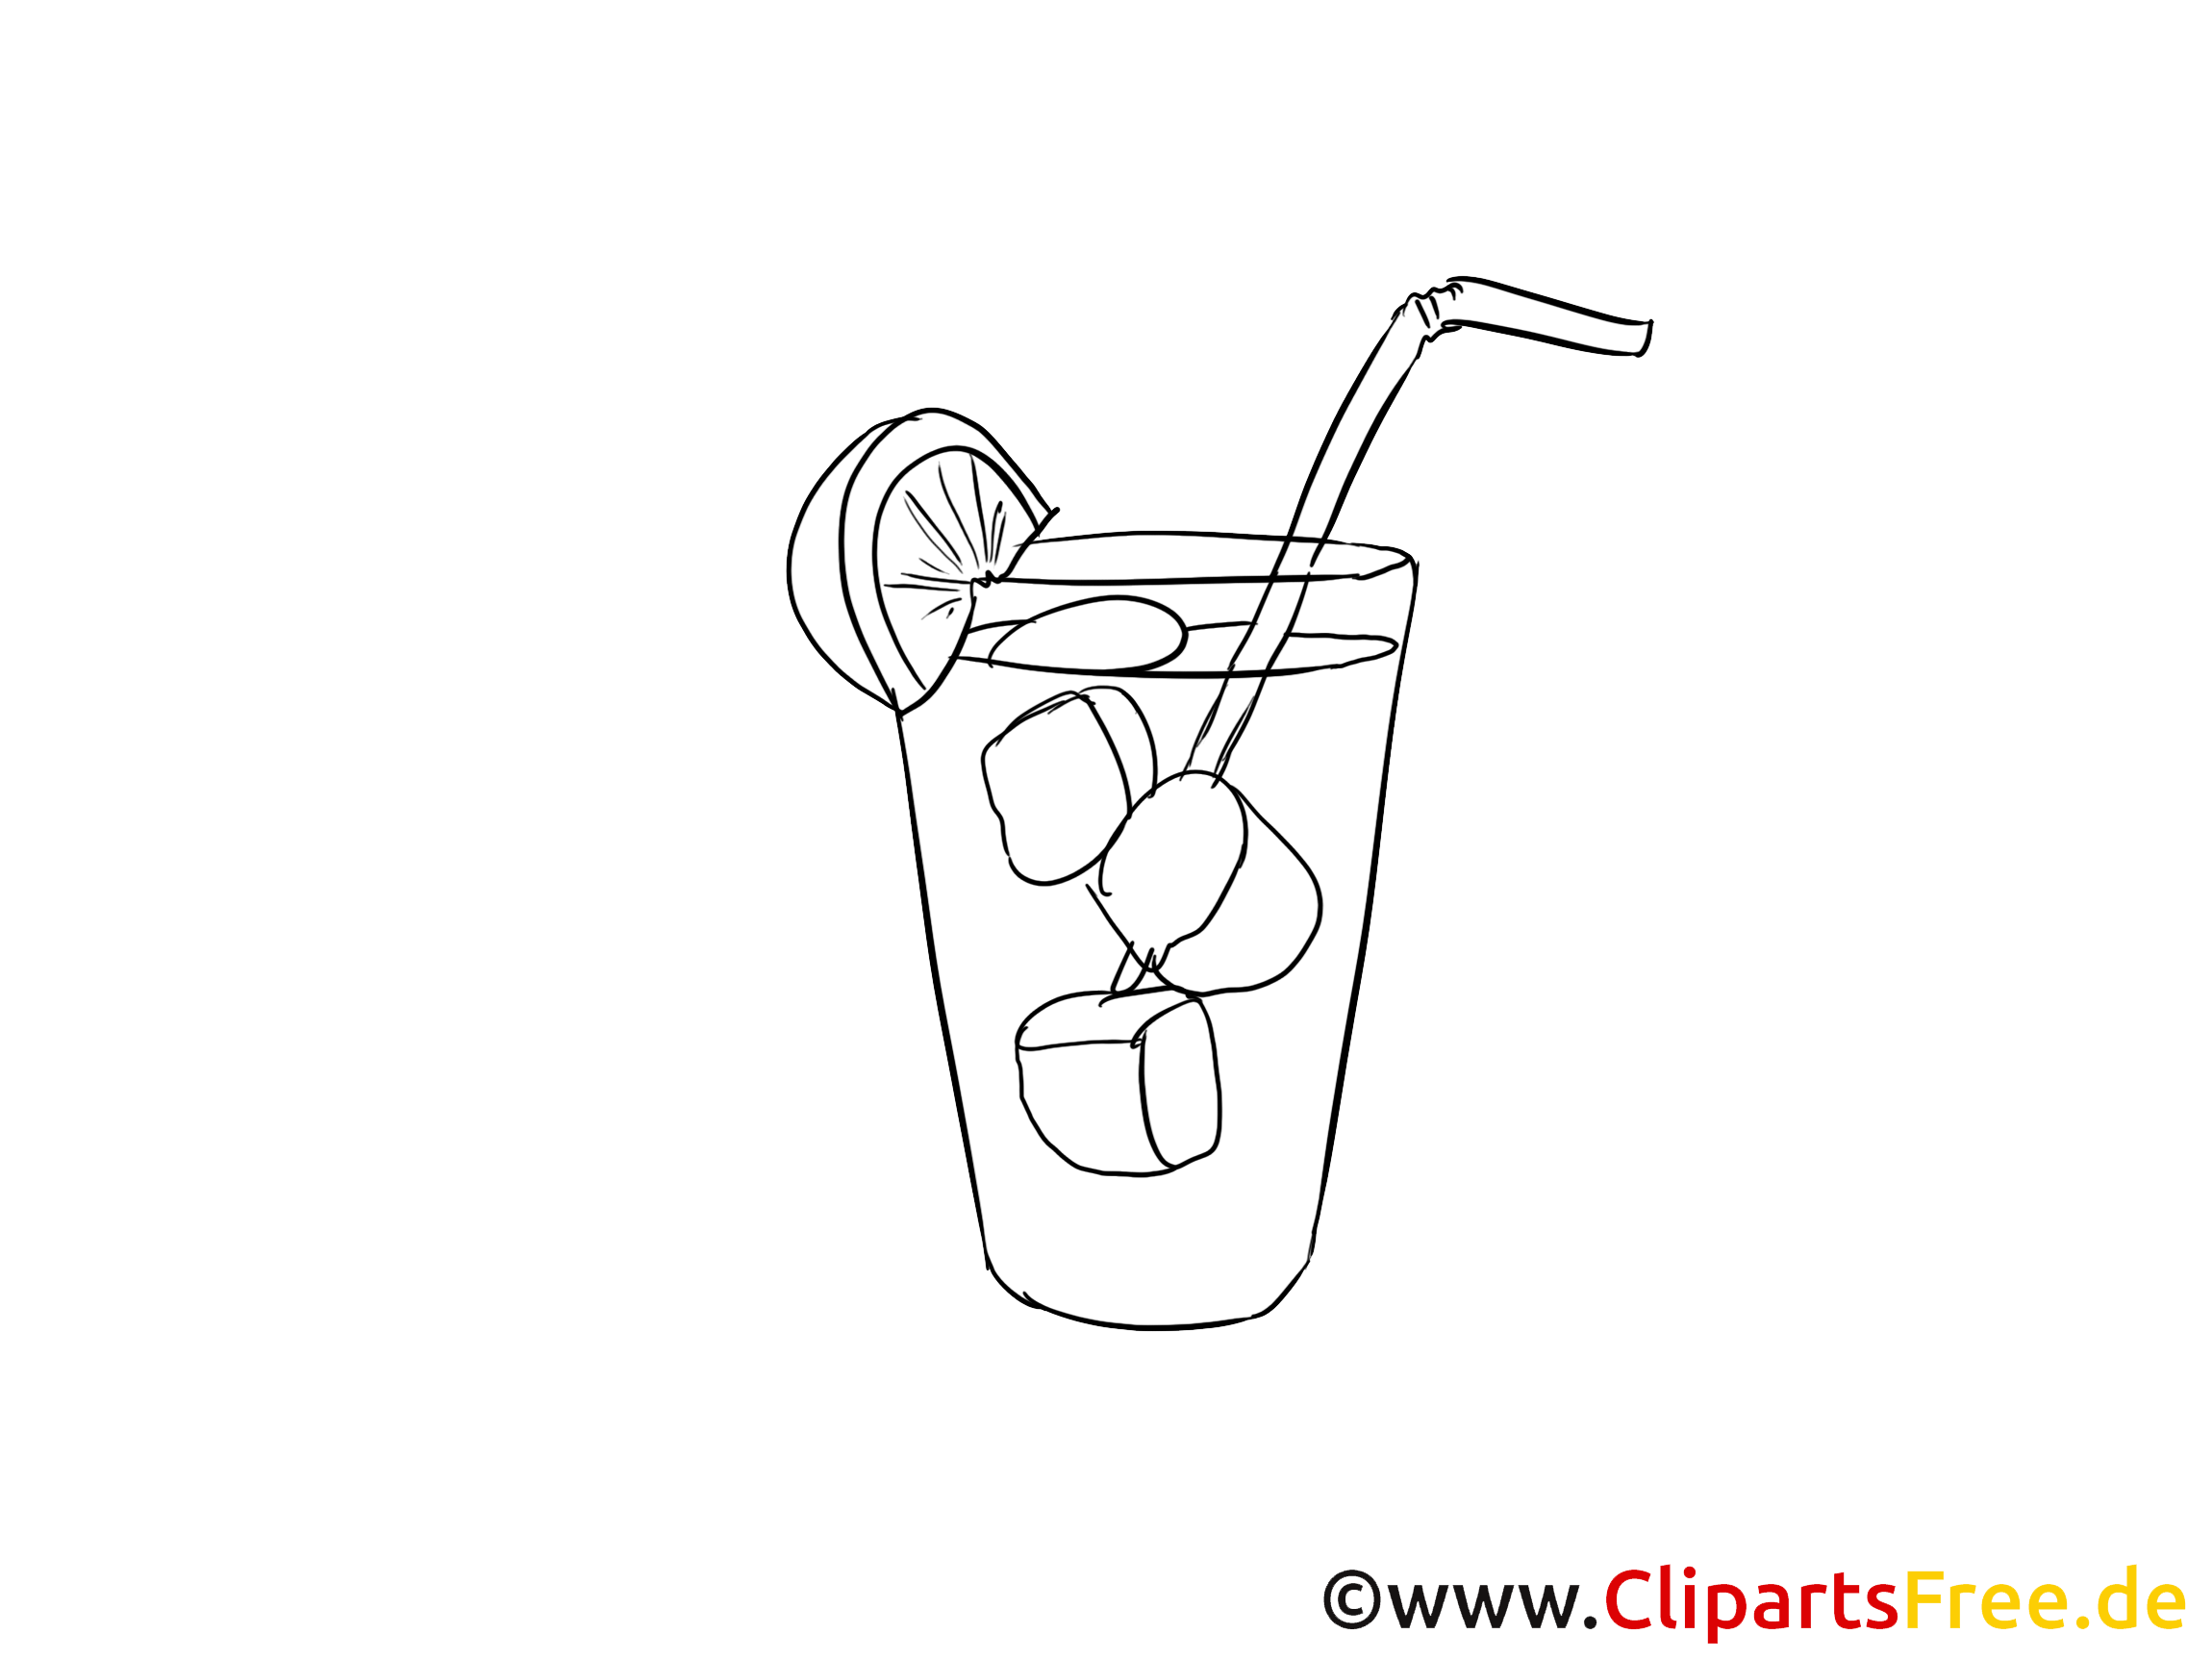 Cocktail dessin coloriage mardi gras t l charger - Dessin cocktail ...